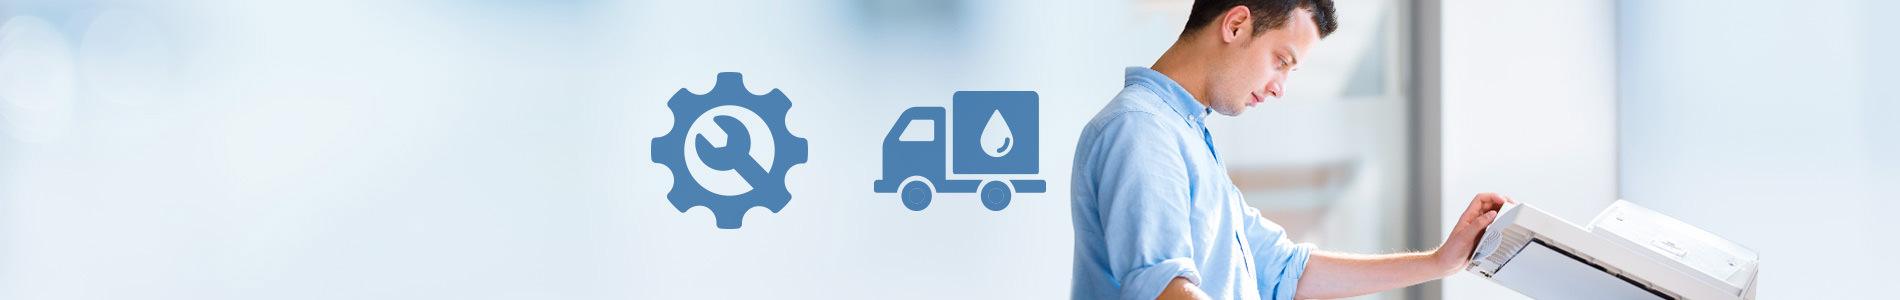 Wabeko Büro Lösungen in Ulm, Neu-Ulm Service Anfrage